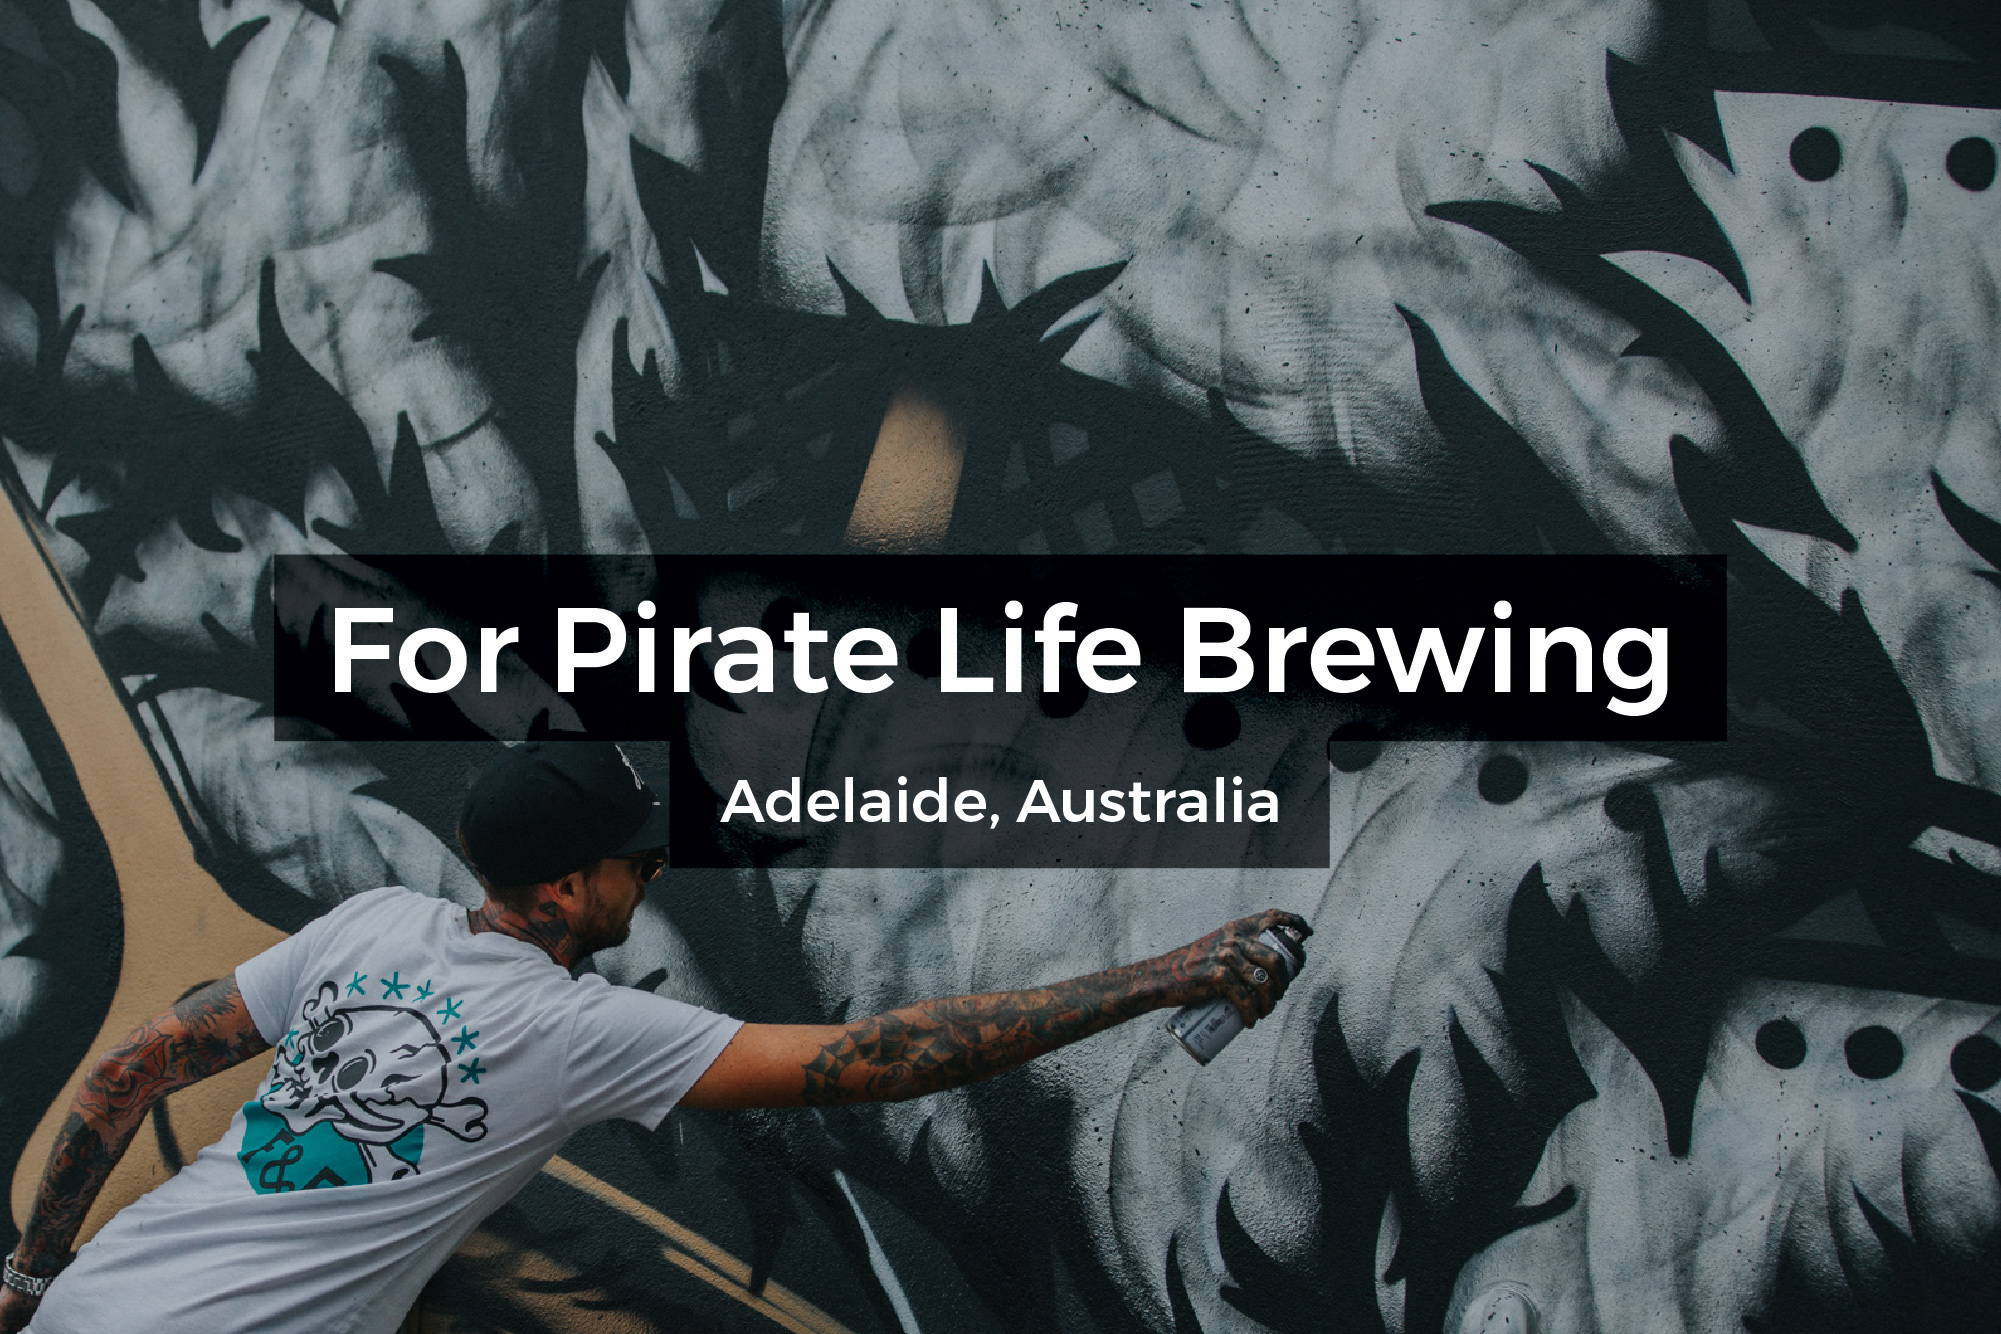 Pirate Life Brewing mural in Adelaide, Australia by Steen Jones